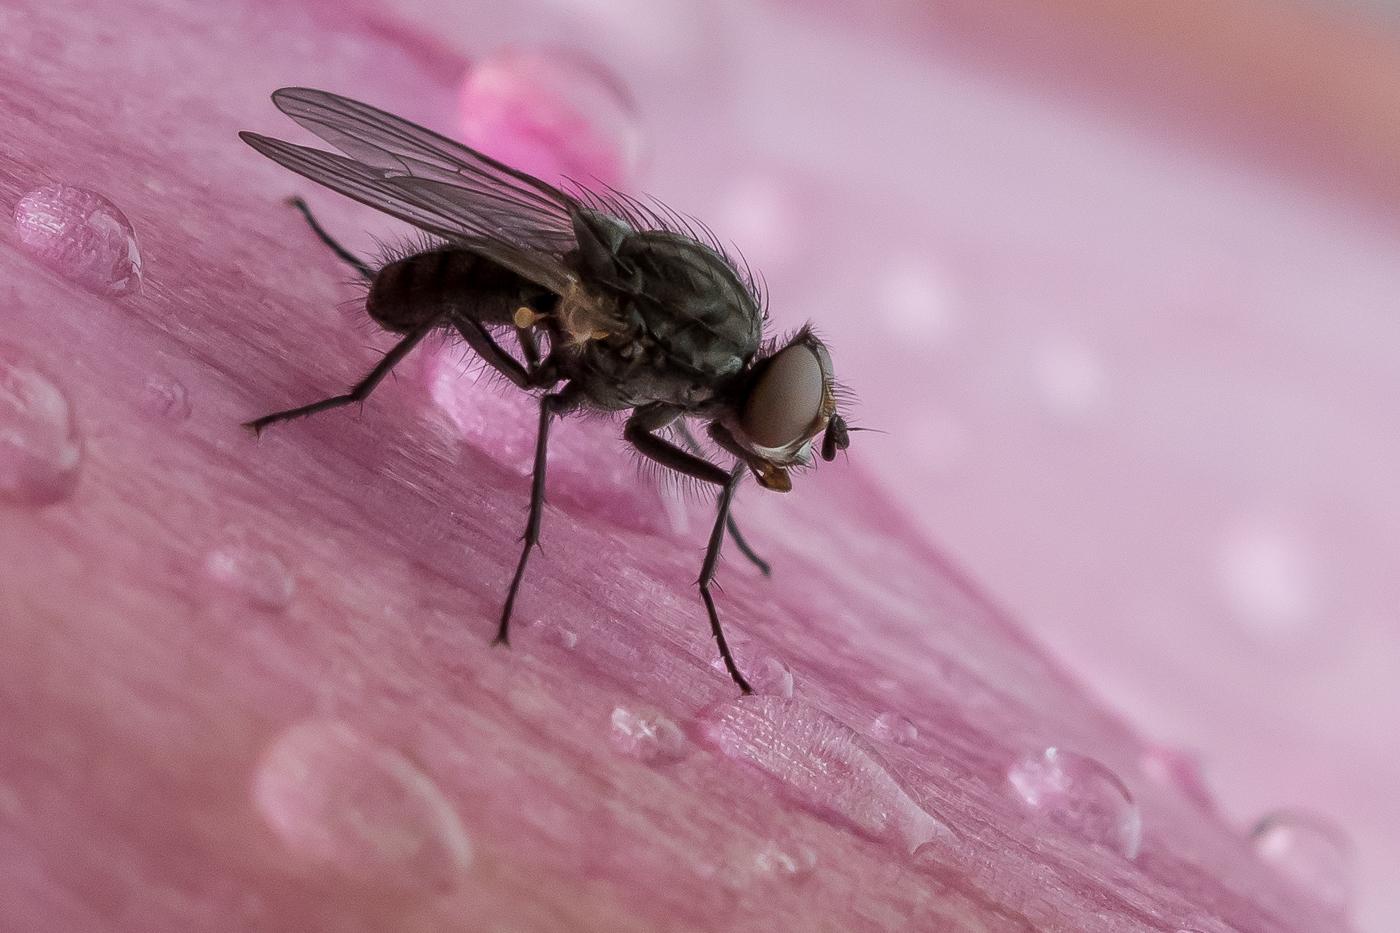 The Fly by Melanie Butcher